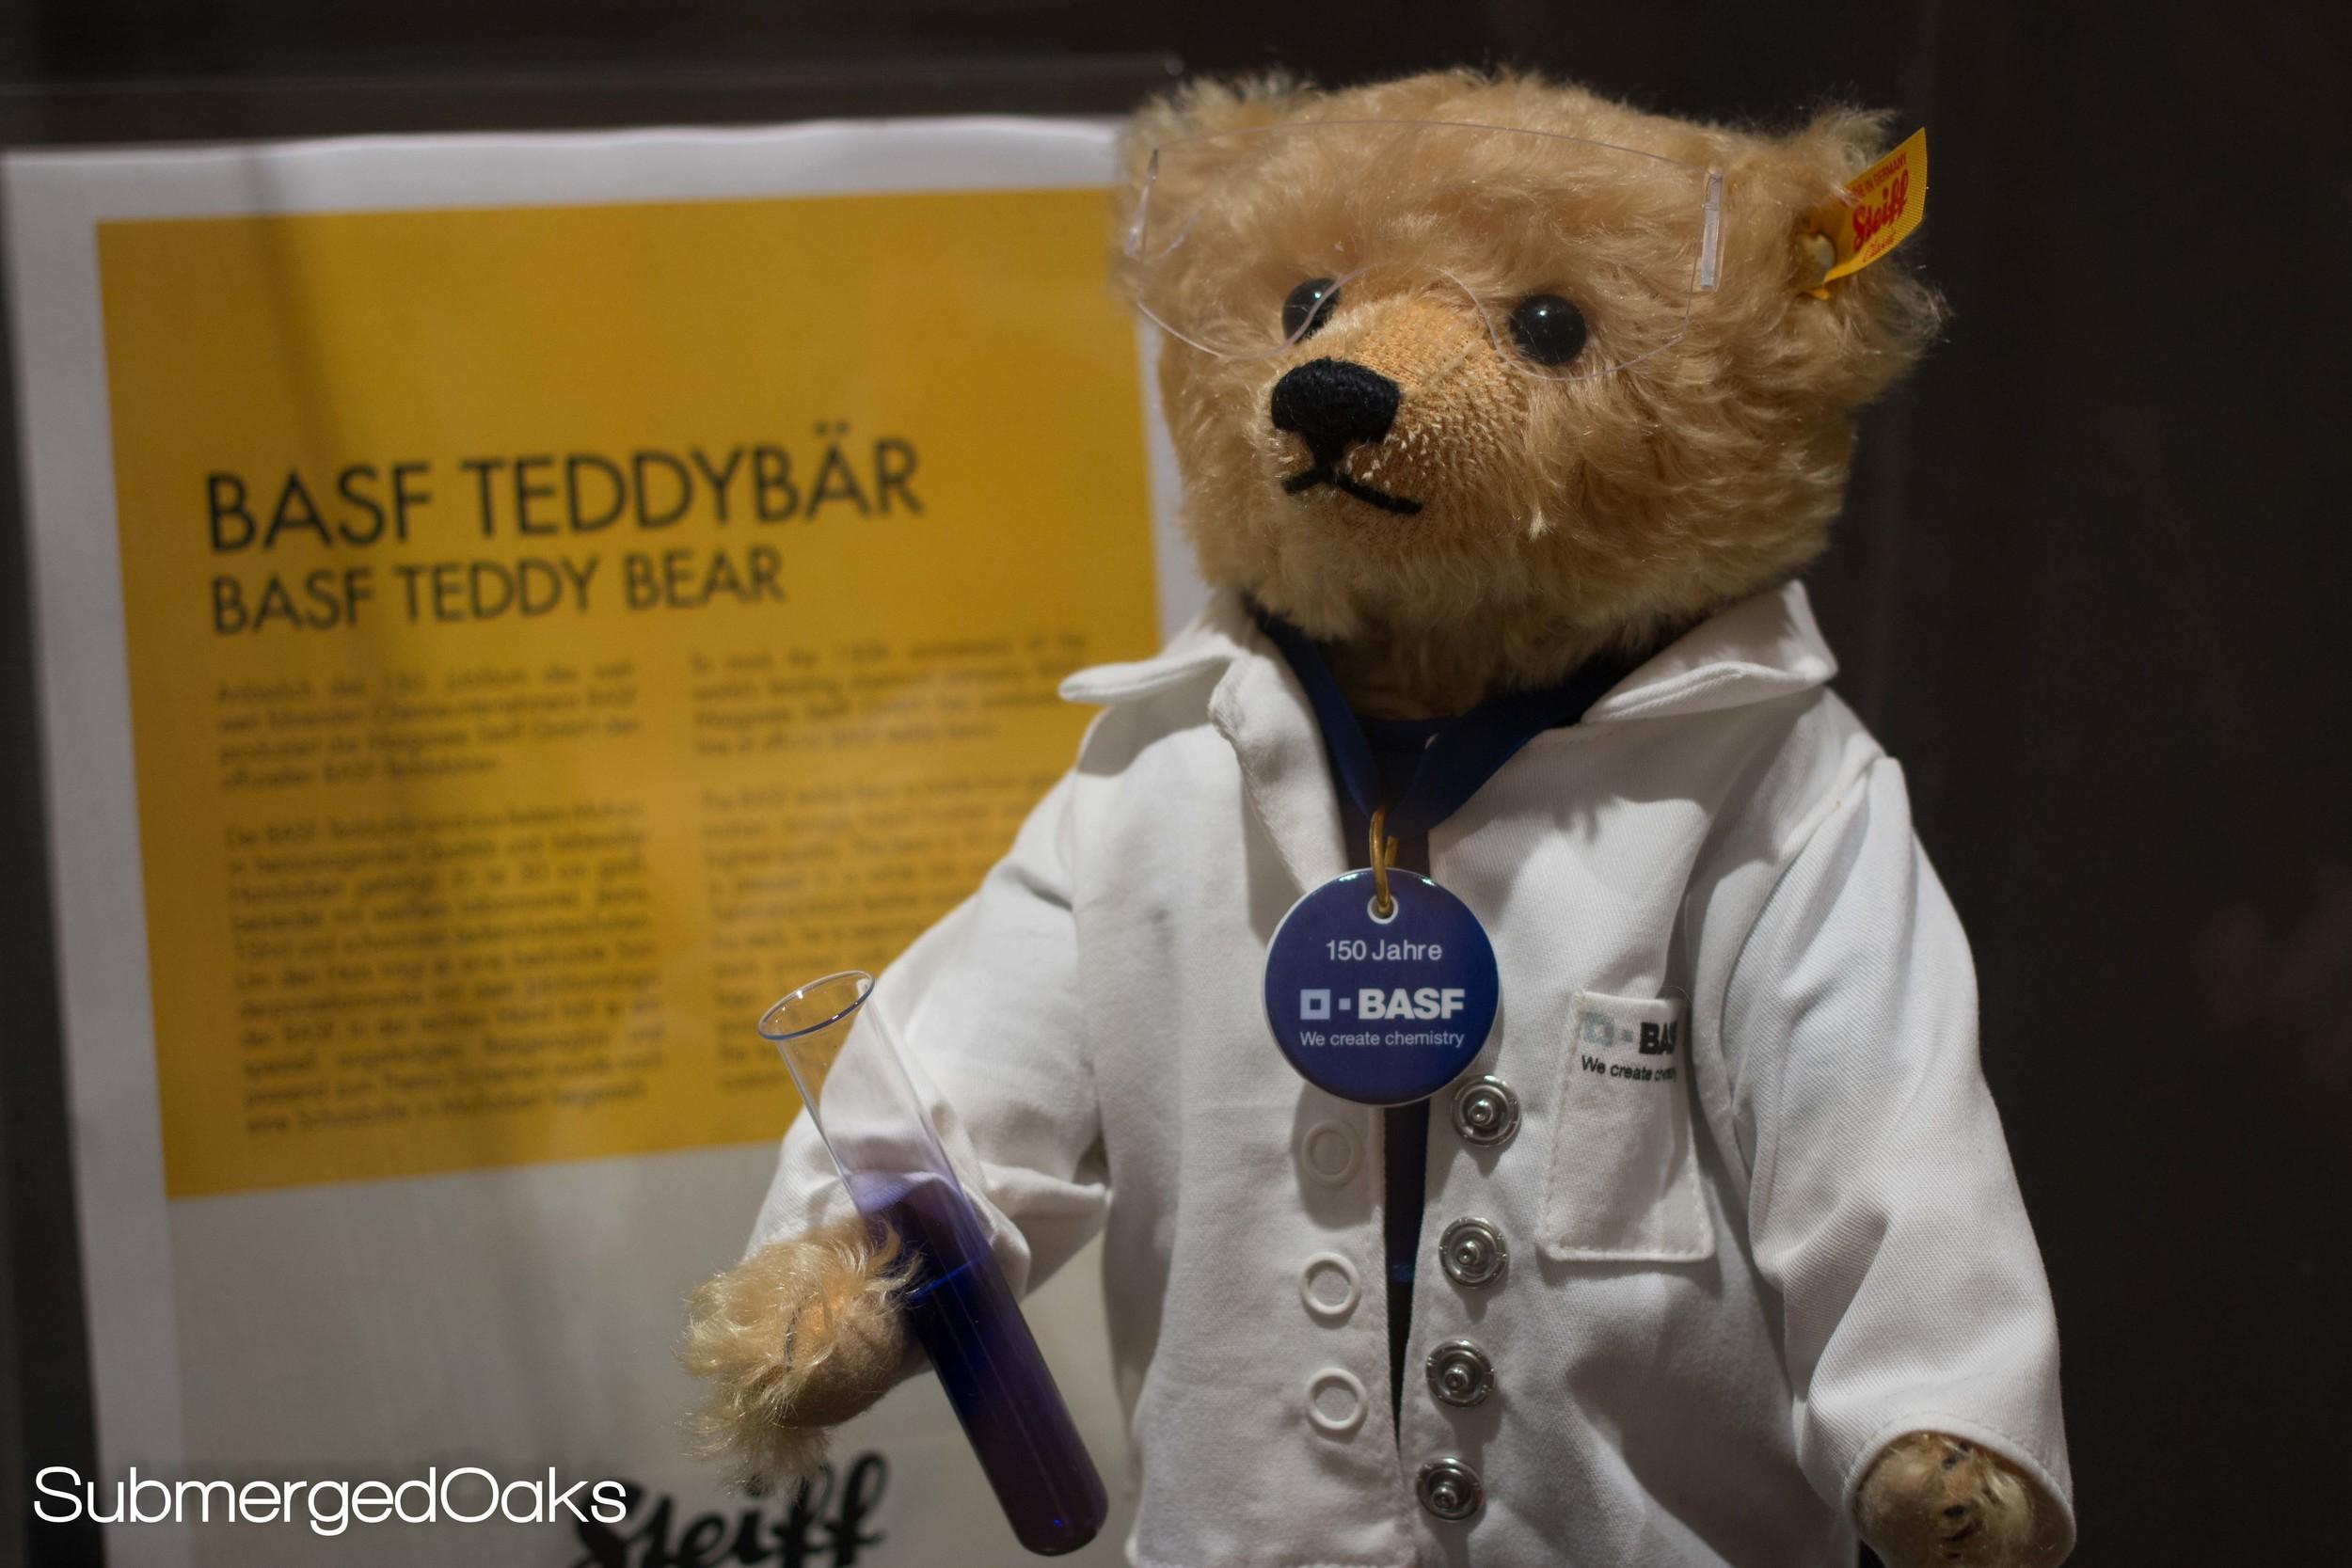 BASF Steiff Teddy bear to celebrate the 150th anniversary of BASF